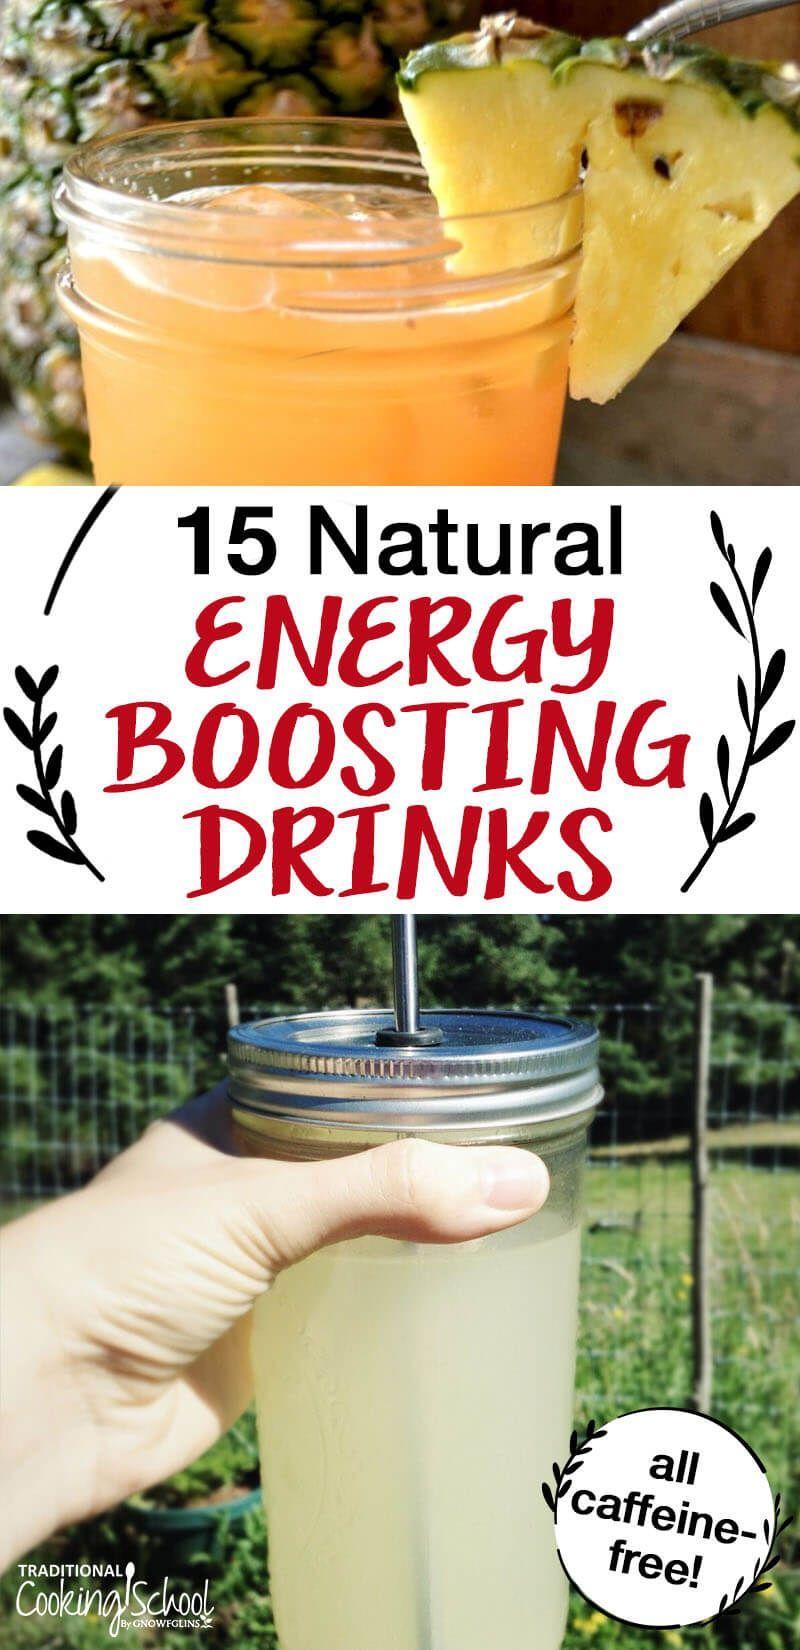 15 Natural Energy Boosting Drinks No Caffeine Allowed In 2020 Natural Energy Drinks Energy Smoothies Healthy Drinks